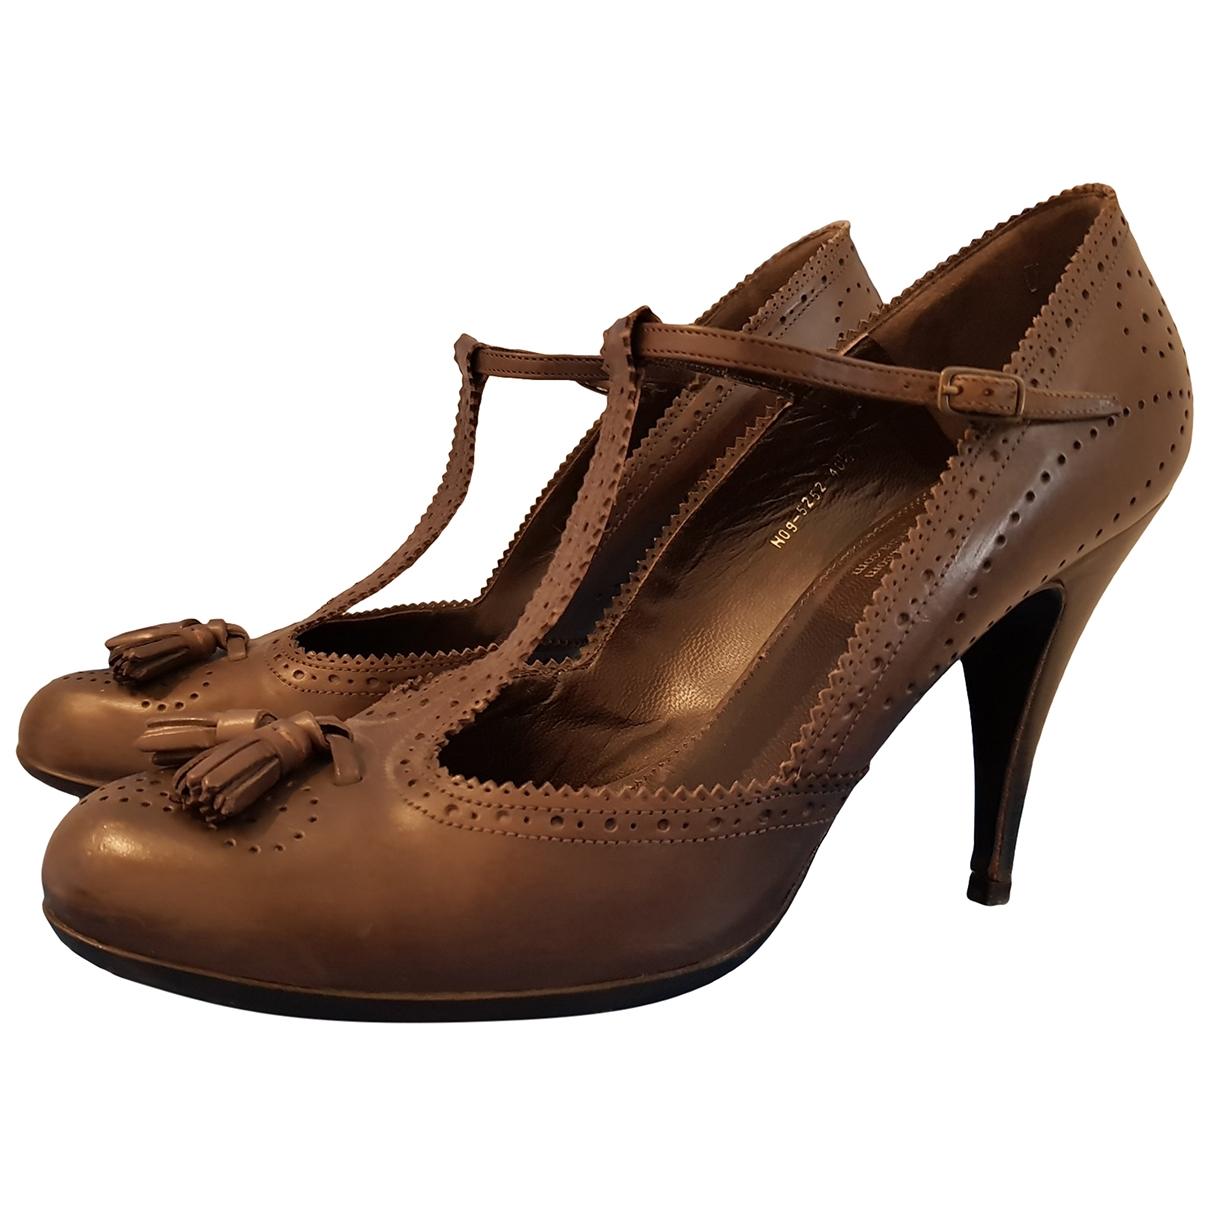 Pedro Garcia \N Brown Leather Heels for Women 40.5 EU